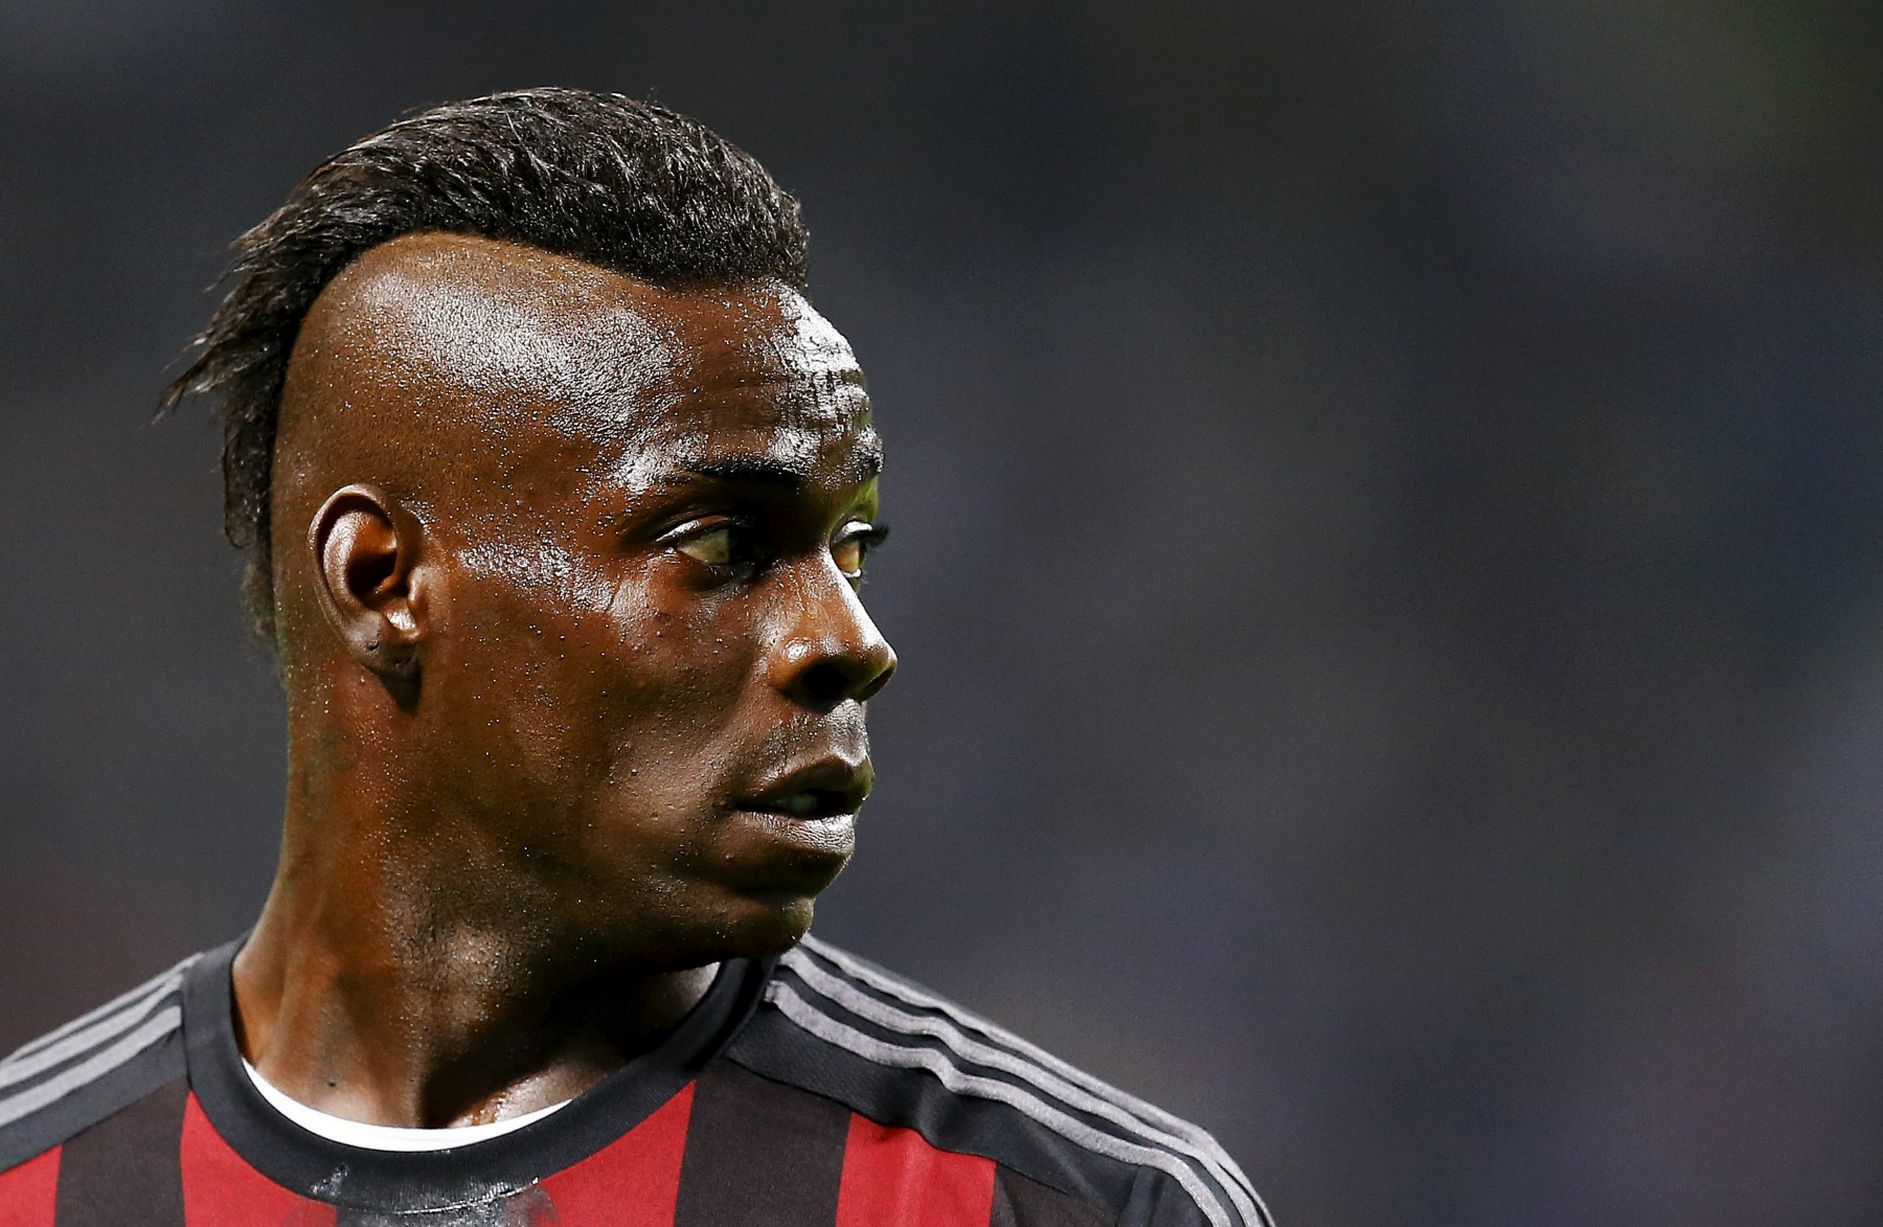 Mario Balotelli mohawk hairstyles